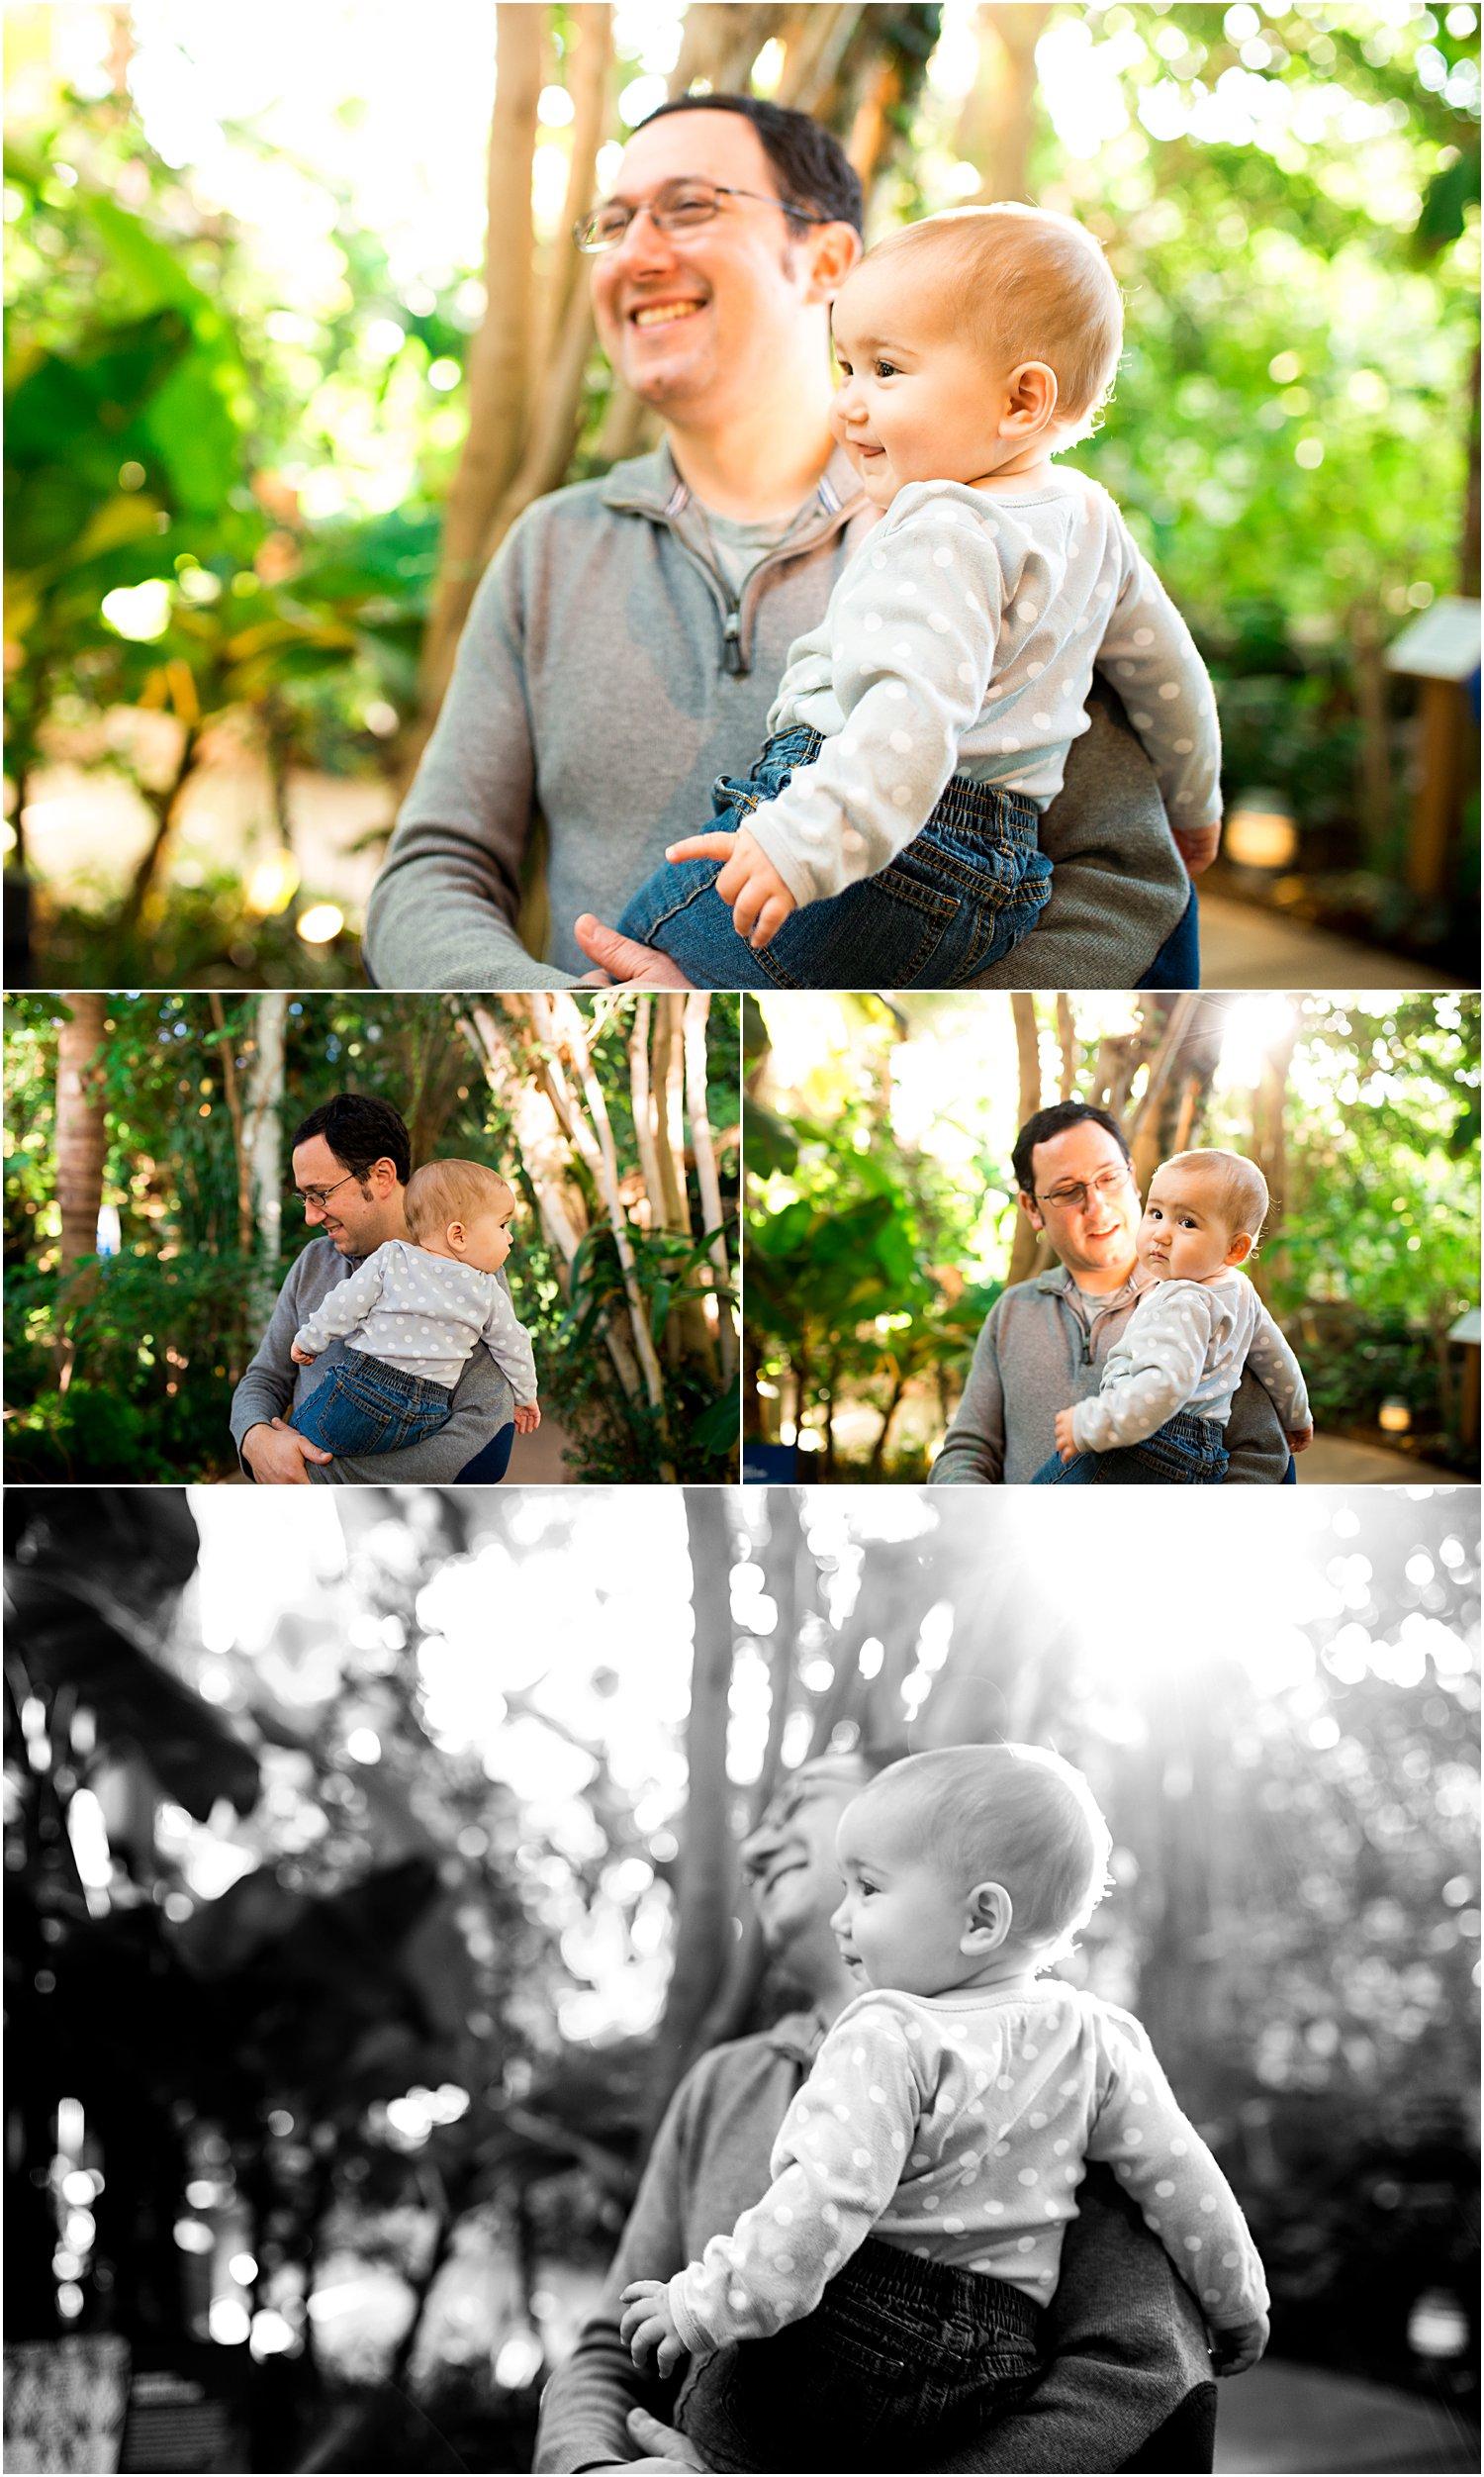 familypictures_nov2016-29.jpg